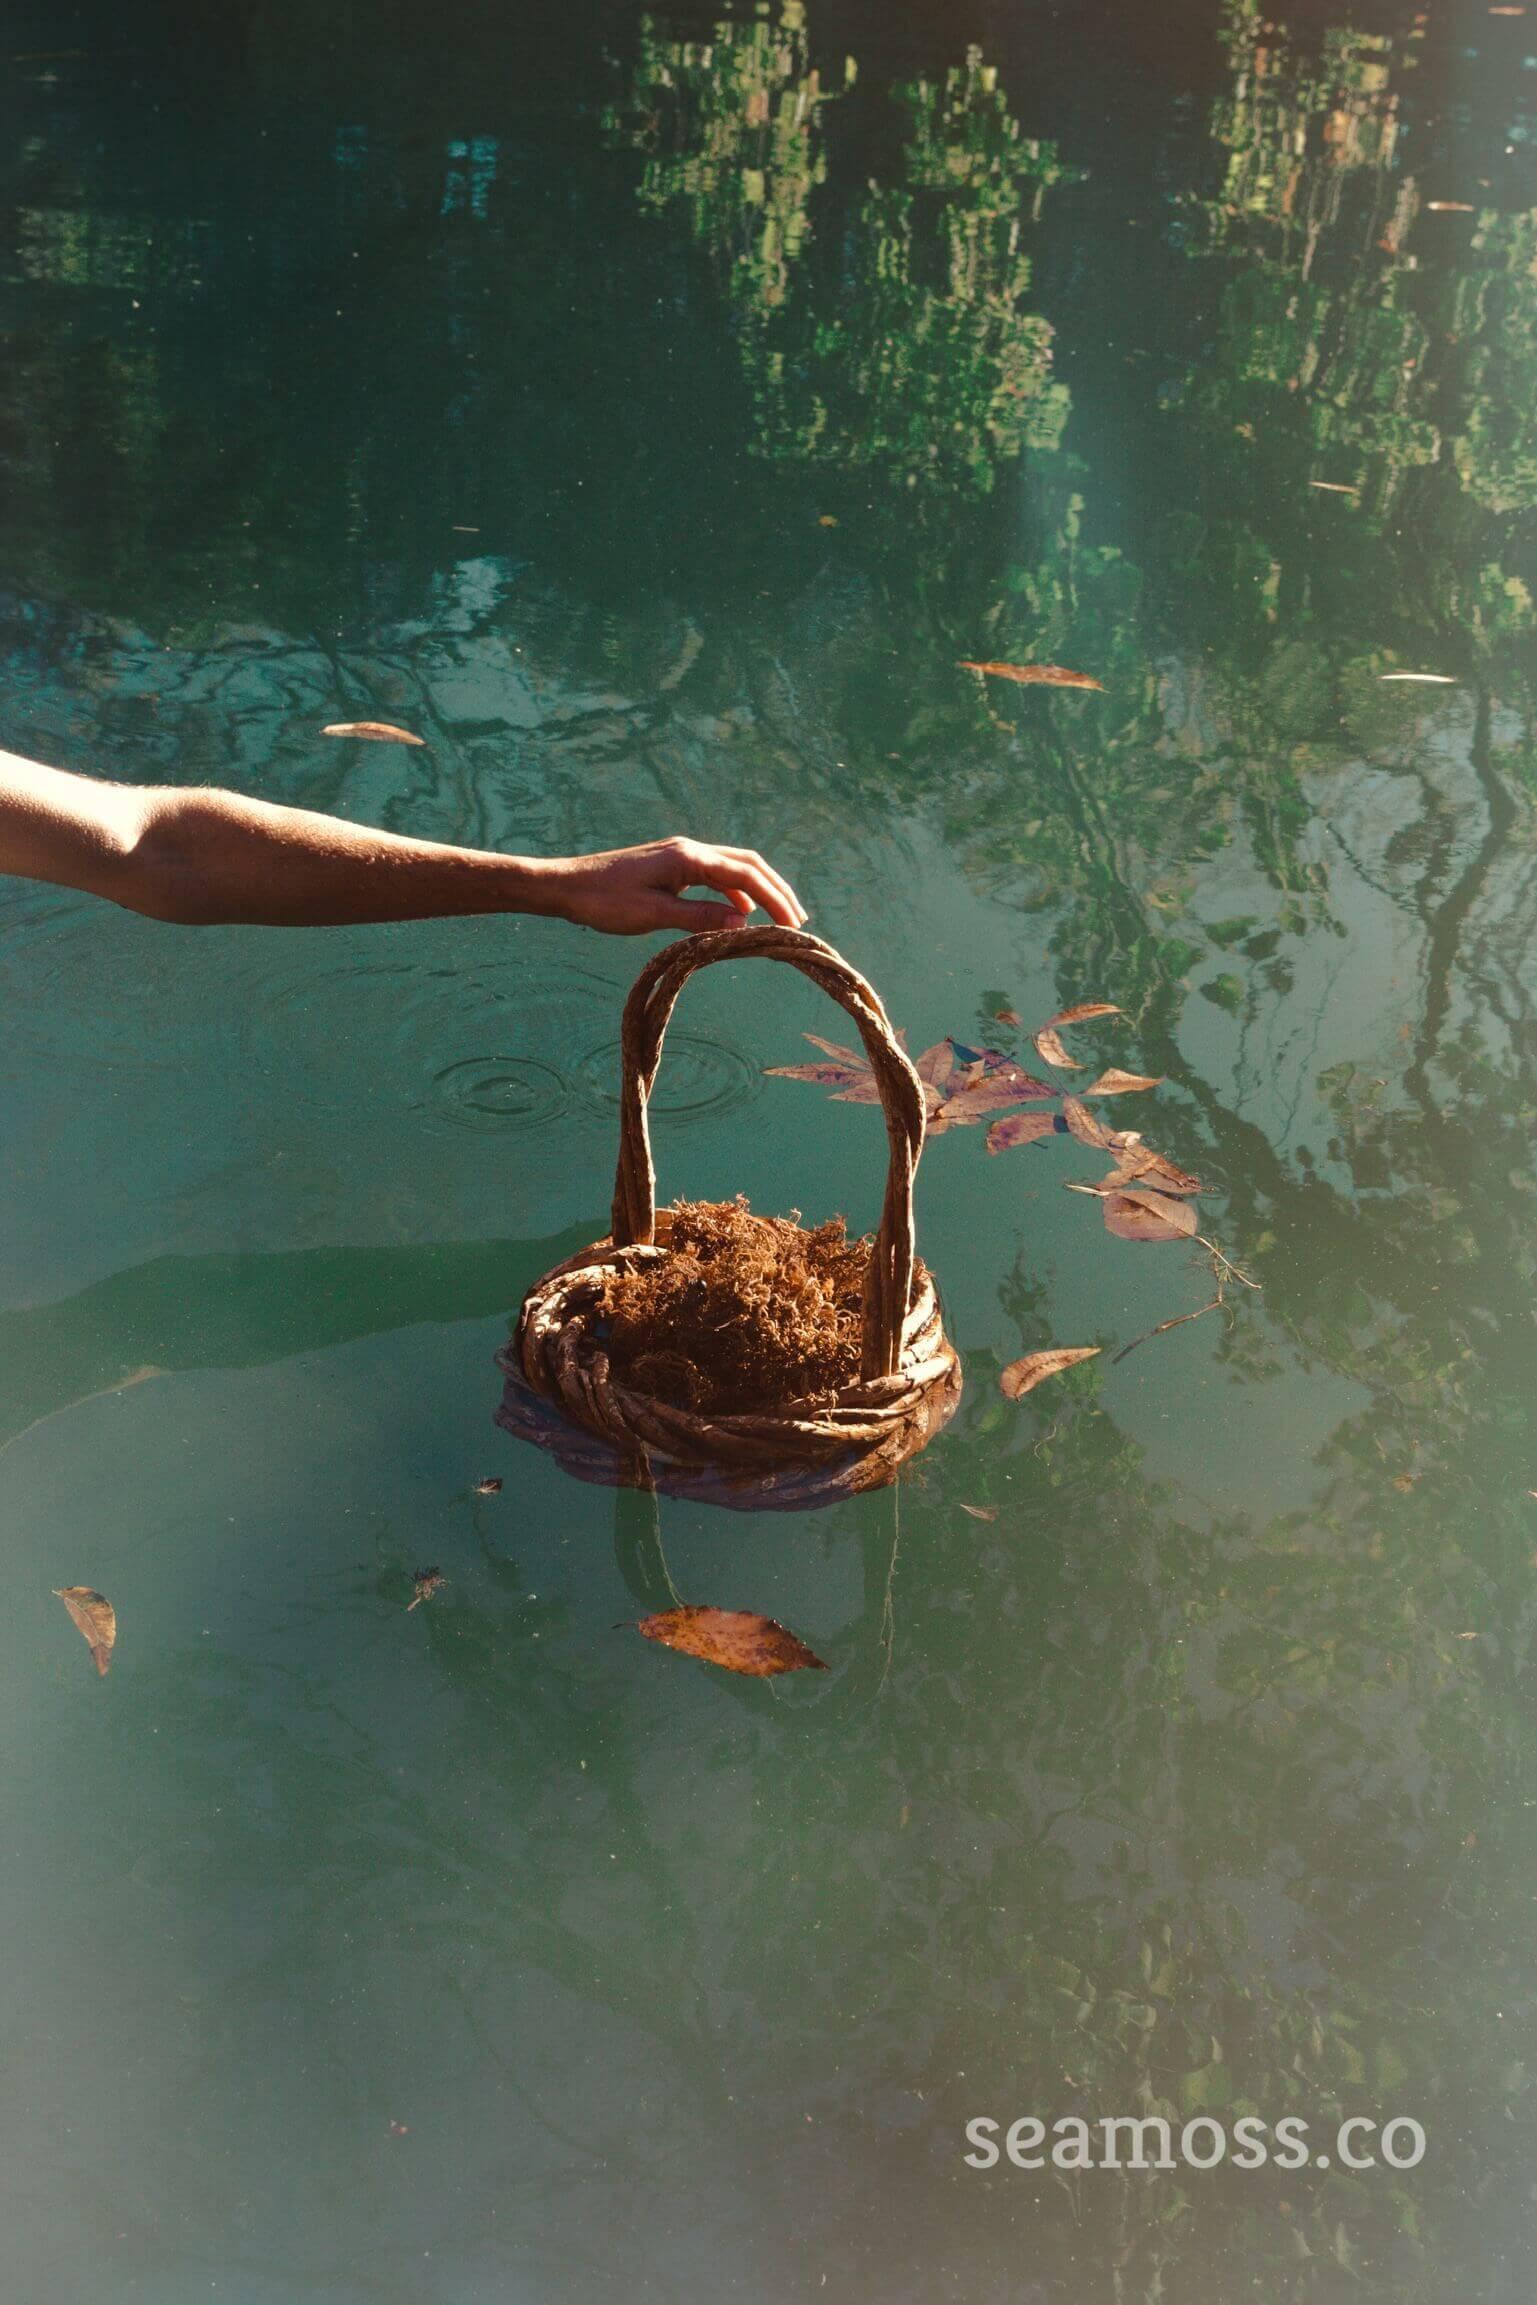 Basket of sea moss floating in Barton Springs